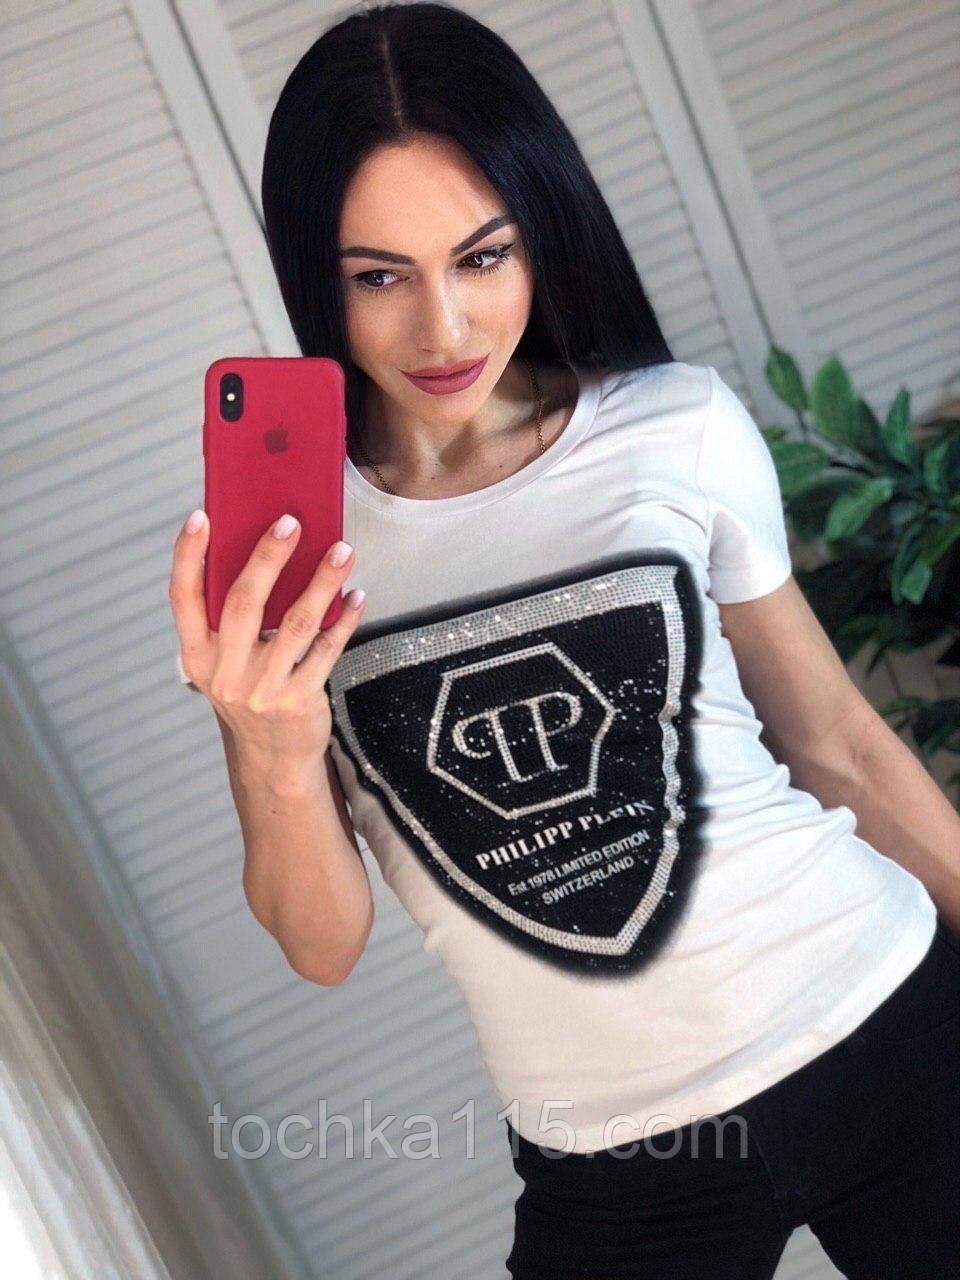 Летняя брендовая футболка, РР, S/M/L/XL, цвет белый